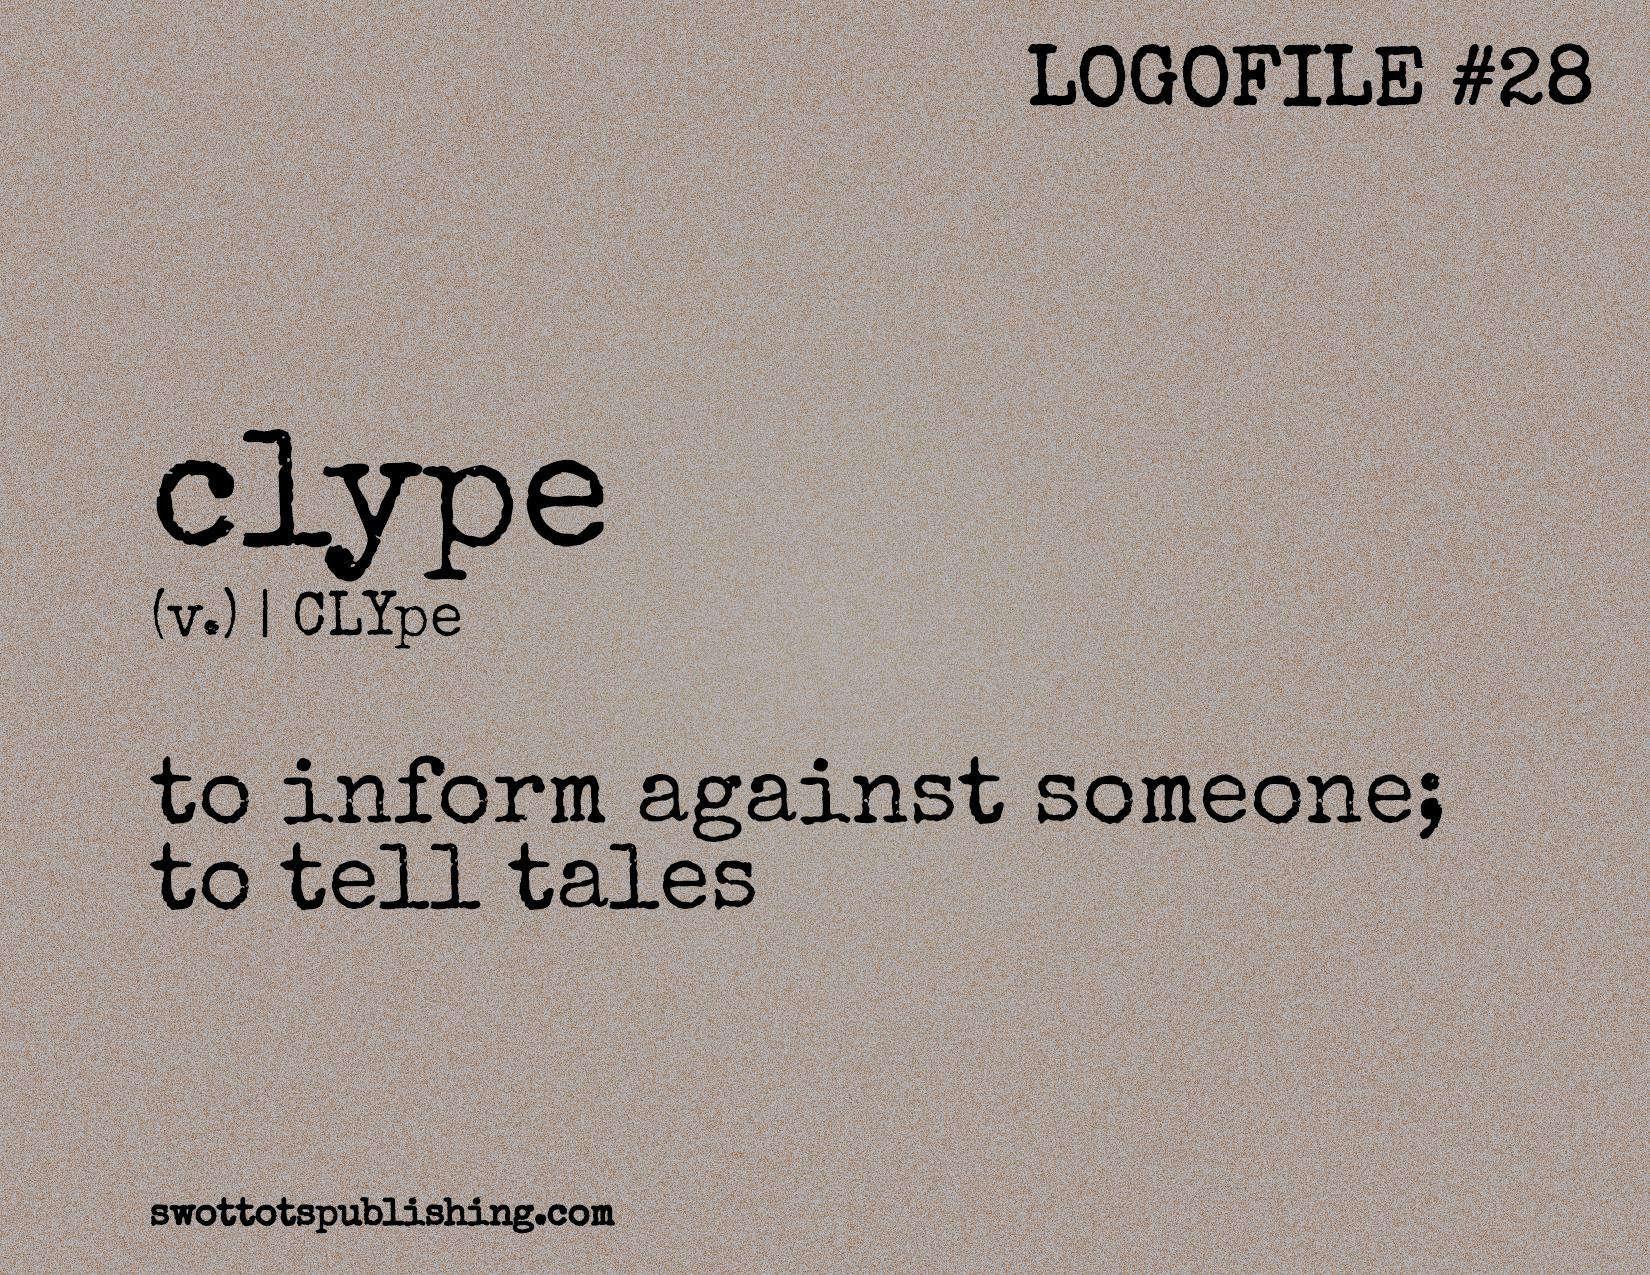 STP Logofile #28 | clype (v.)